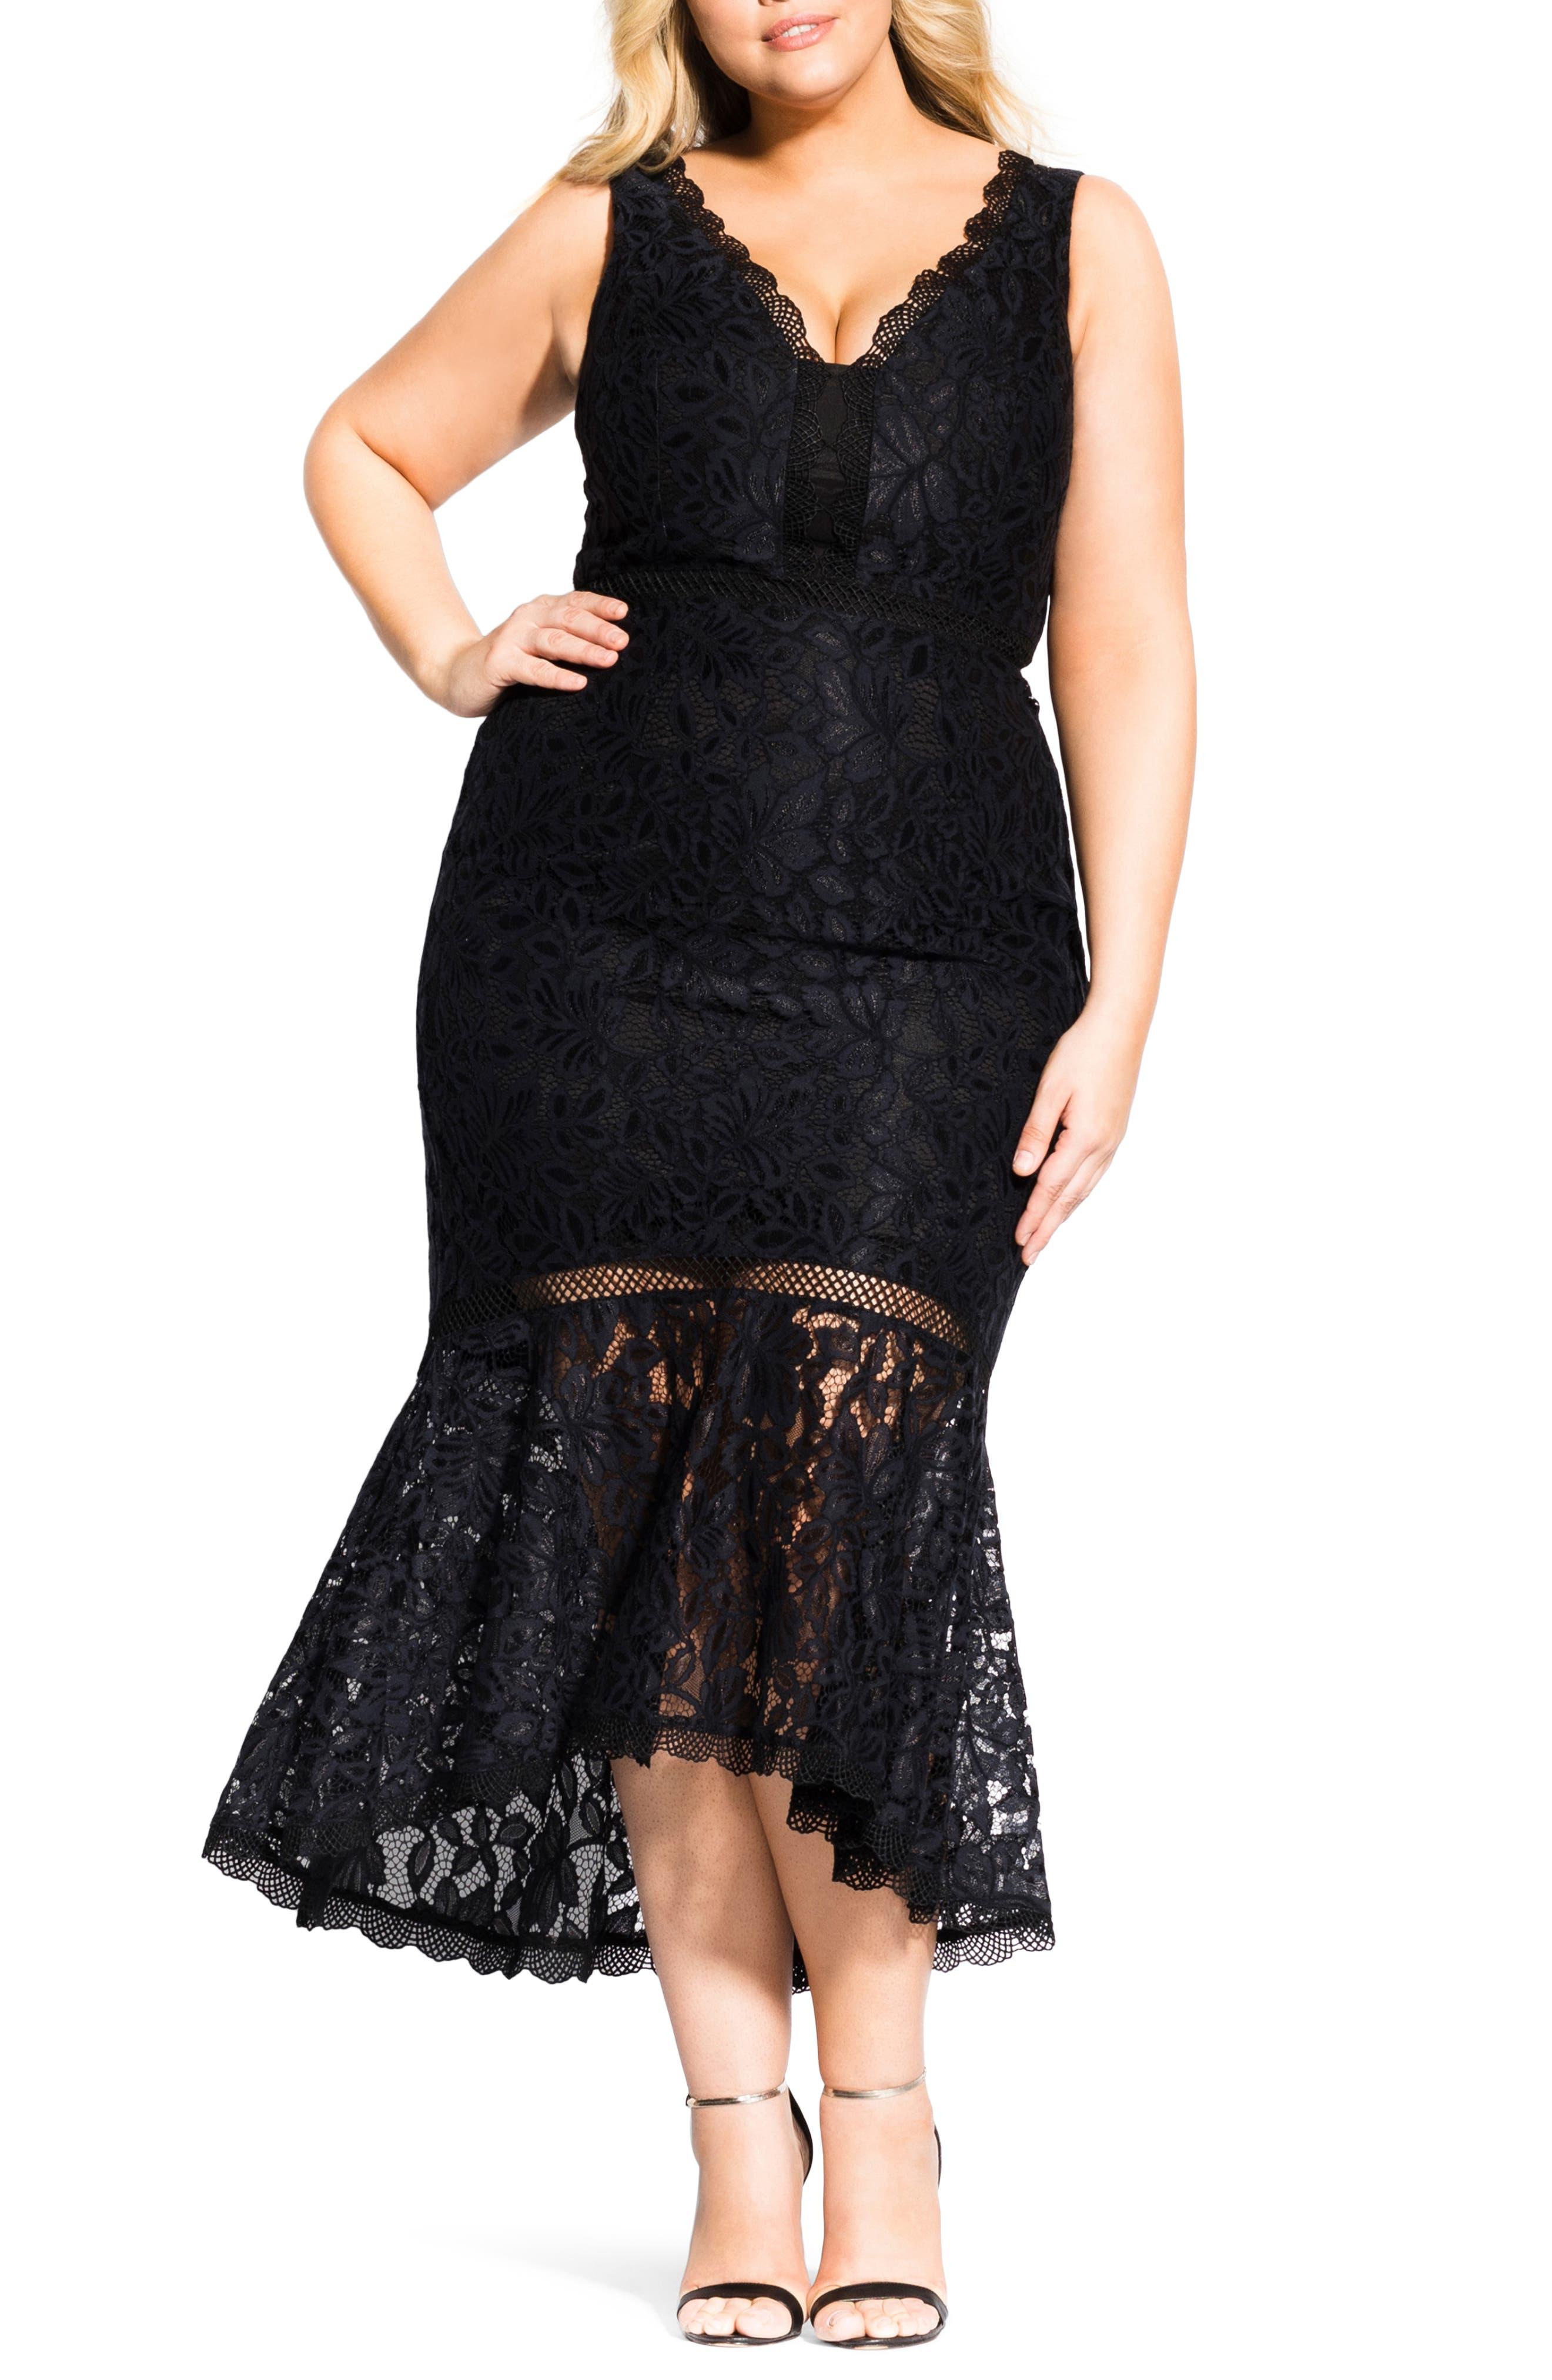 Plus Size City Chic Ravishing Mermaid Dress, Black